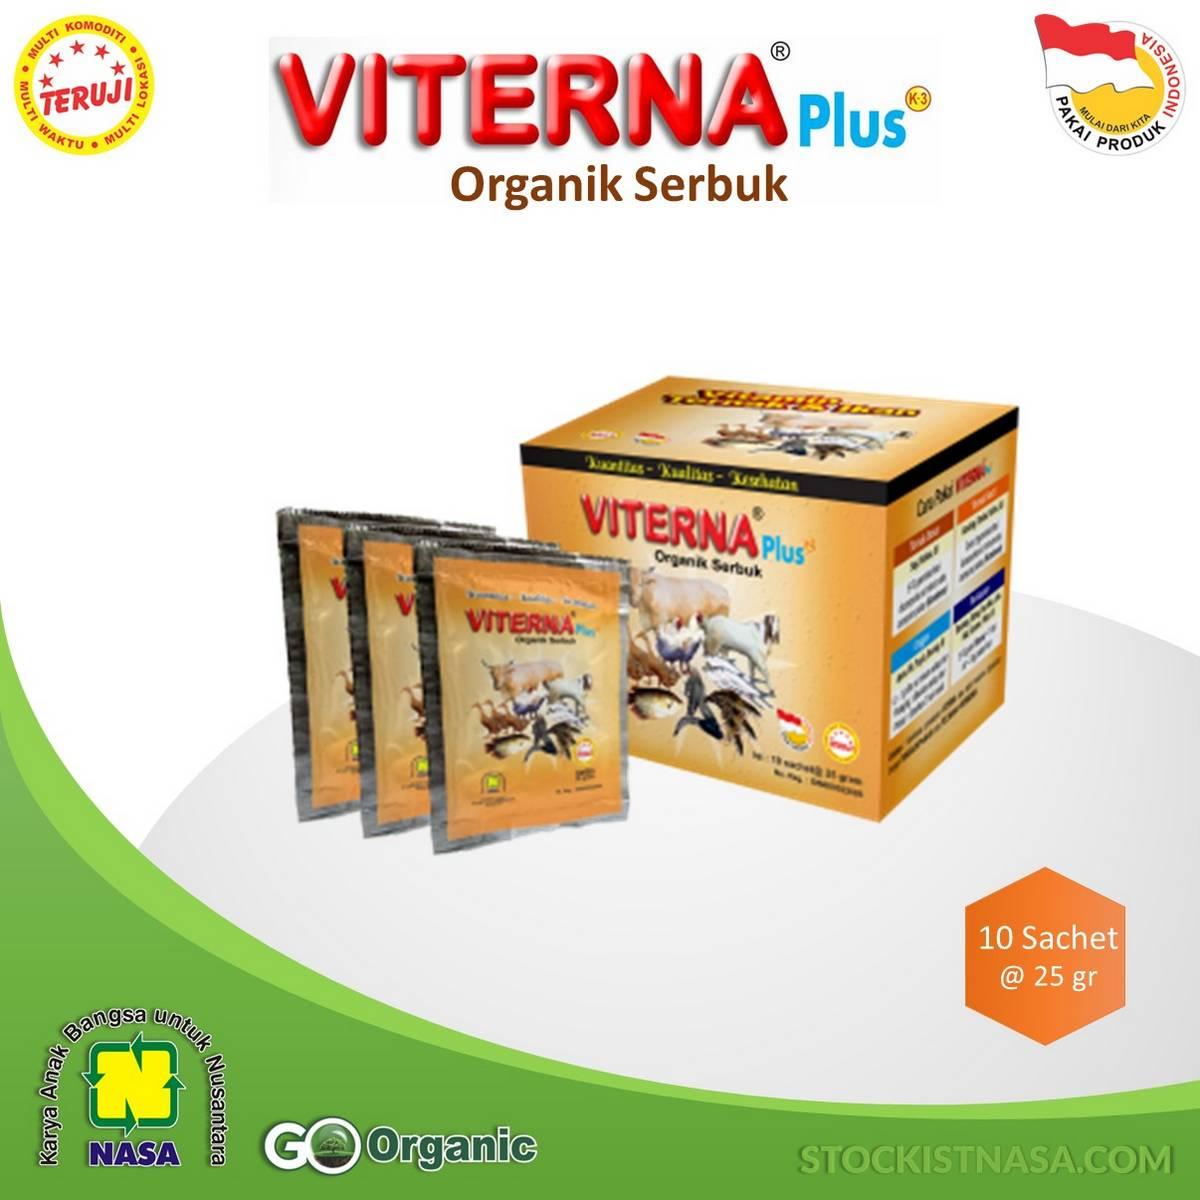 VITERNA Plus Organik Serbuk